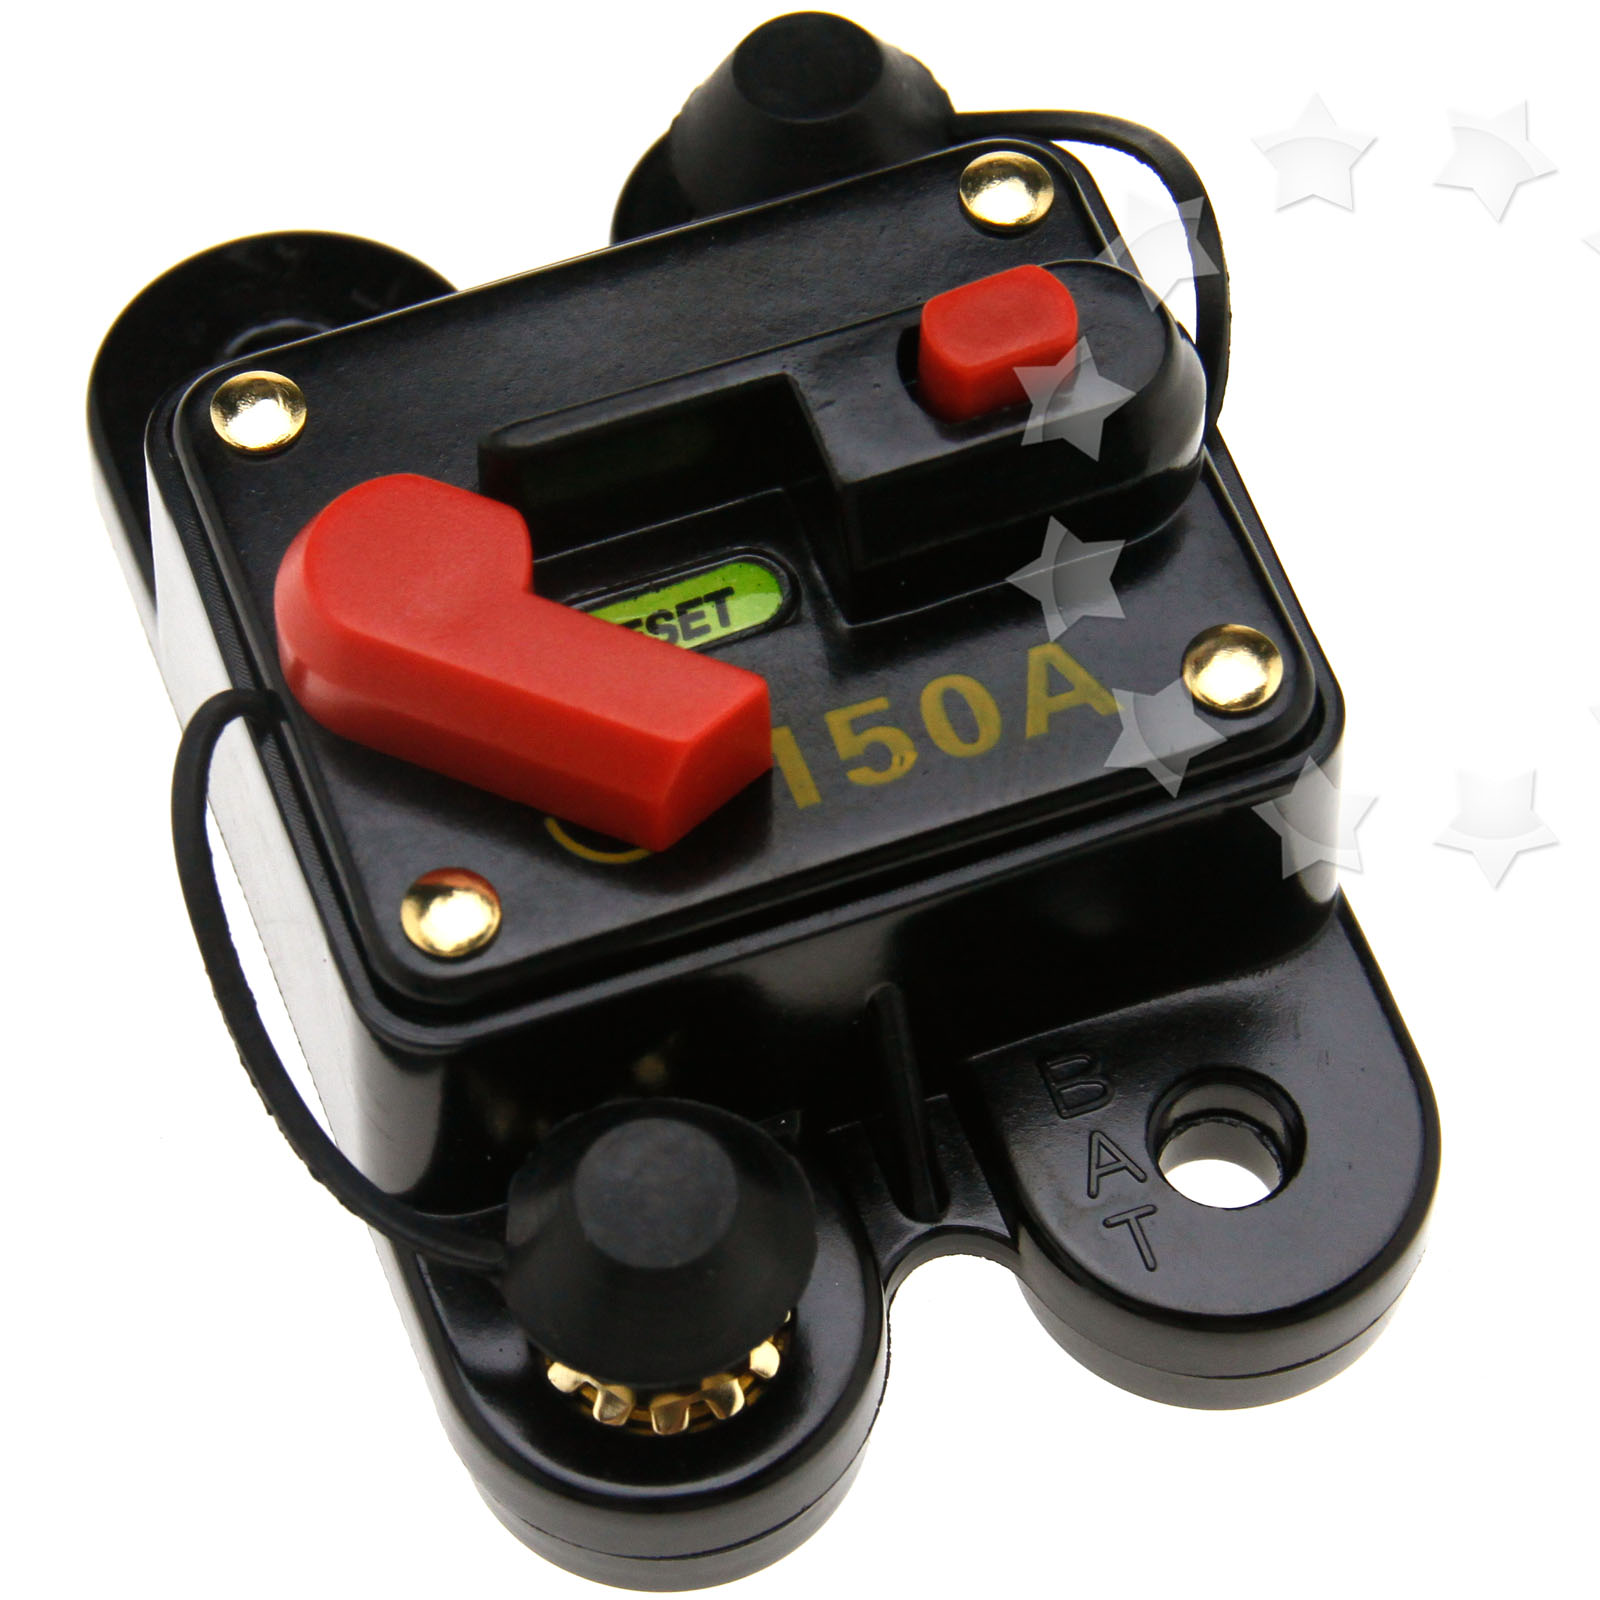 System S Kfz Auto Adapterkabel Media In Ami Mdi Zu: 12/24V Automat 150A Automatik Schalter Auto KFZ LKW Boot